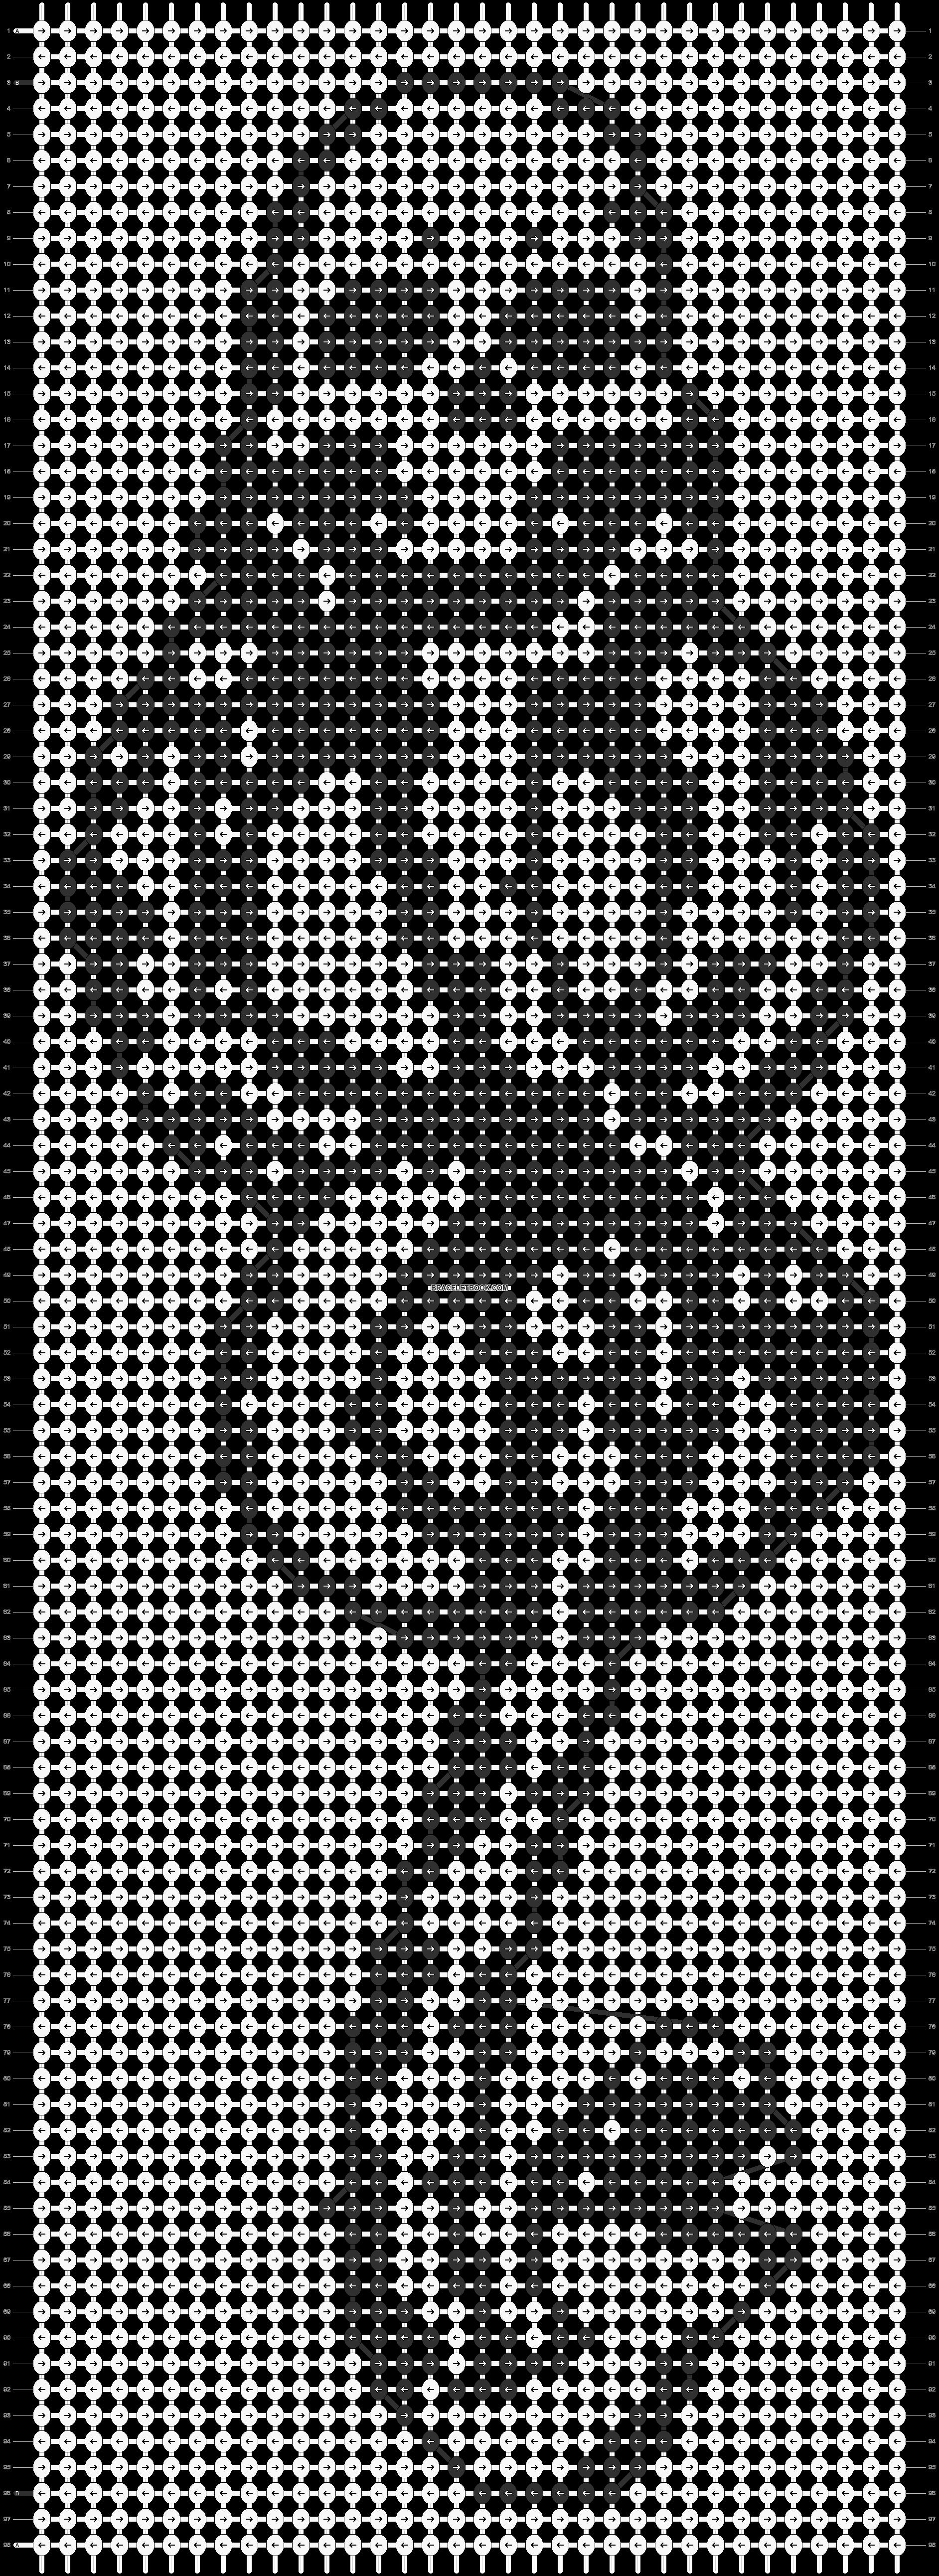 Alpha Pattern #3335 added by mudblood